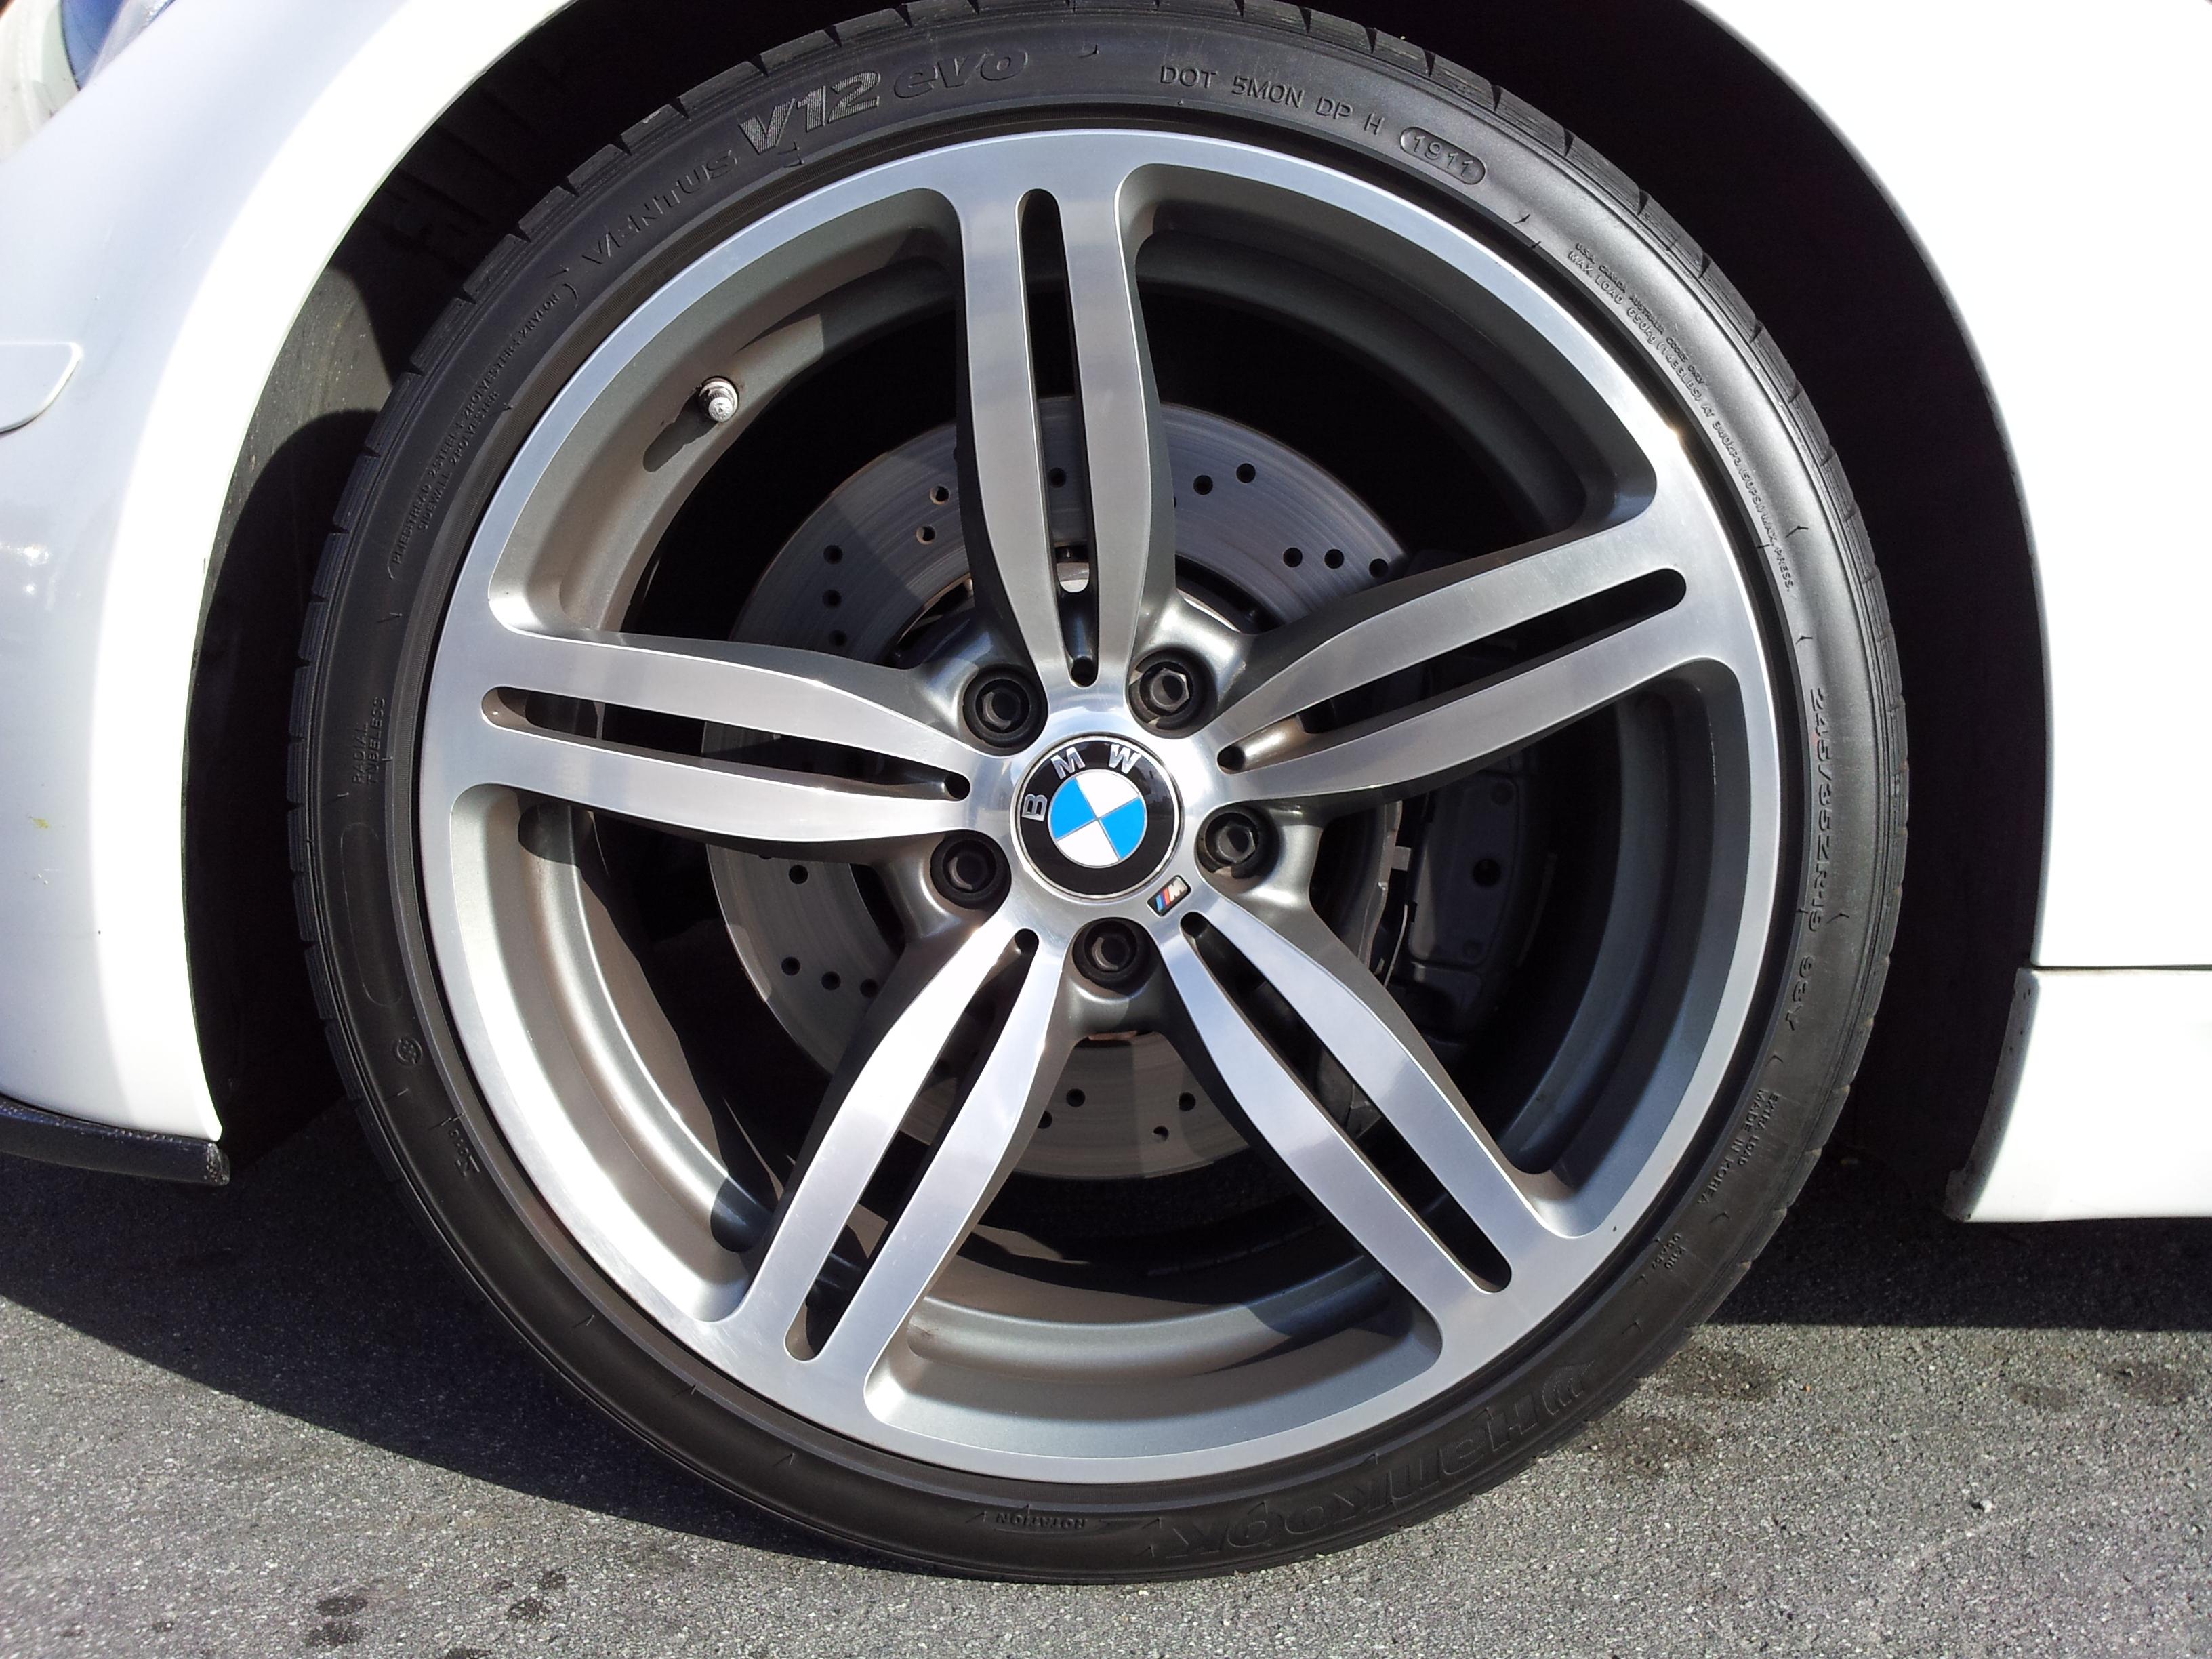 Bay Area - F/S (4) OEM M6 rims w/ tires-20120502_173605.jpg